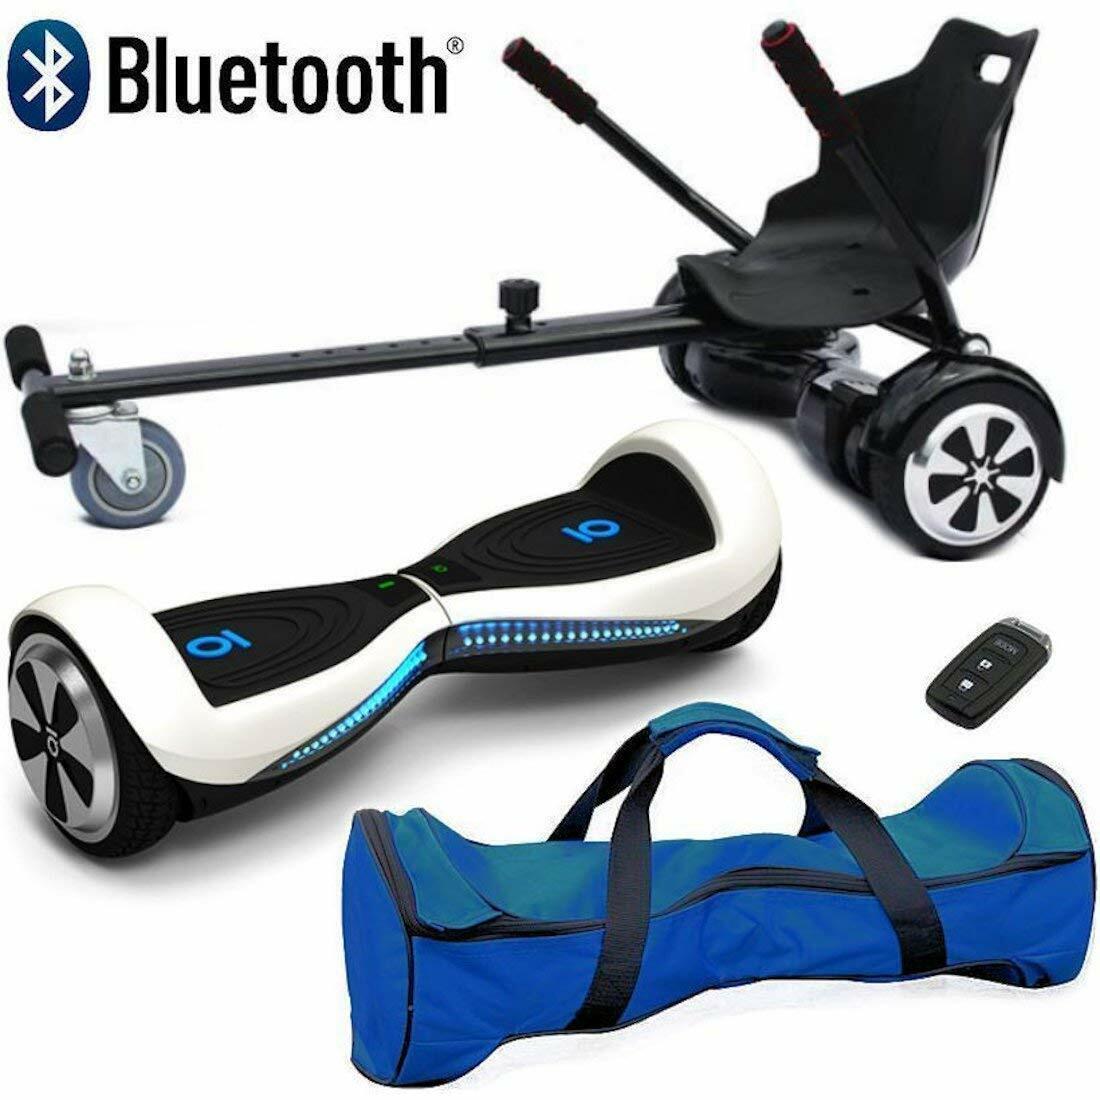 Bluetooth 6.5″ Swegway Hover Scooter Bundle Combo Self Balance Board & Hoverkart WAS £199.99 NOW £169.99 w/code POCKET15 @ eBay